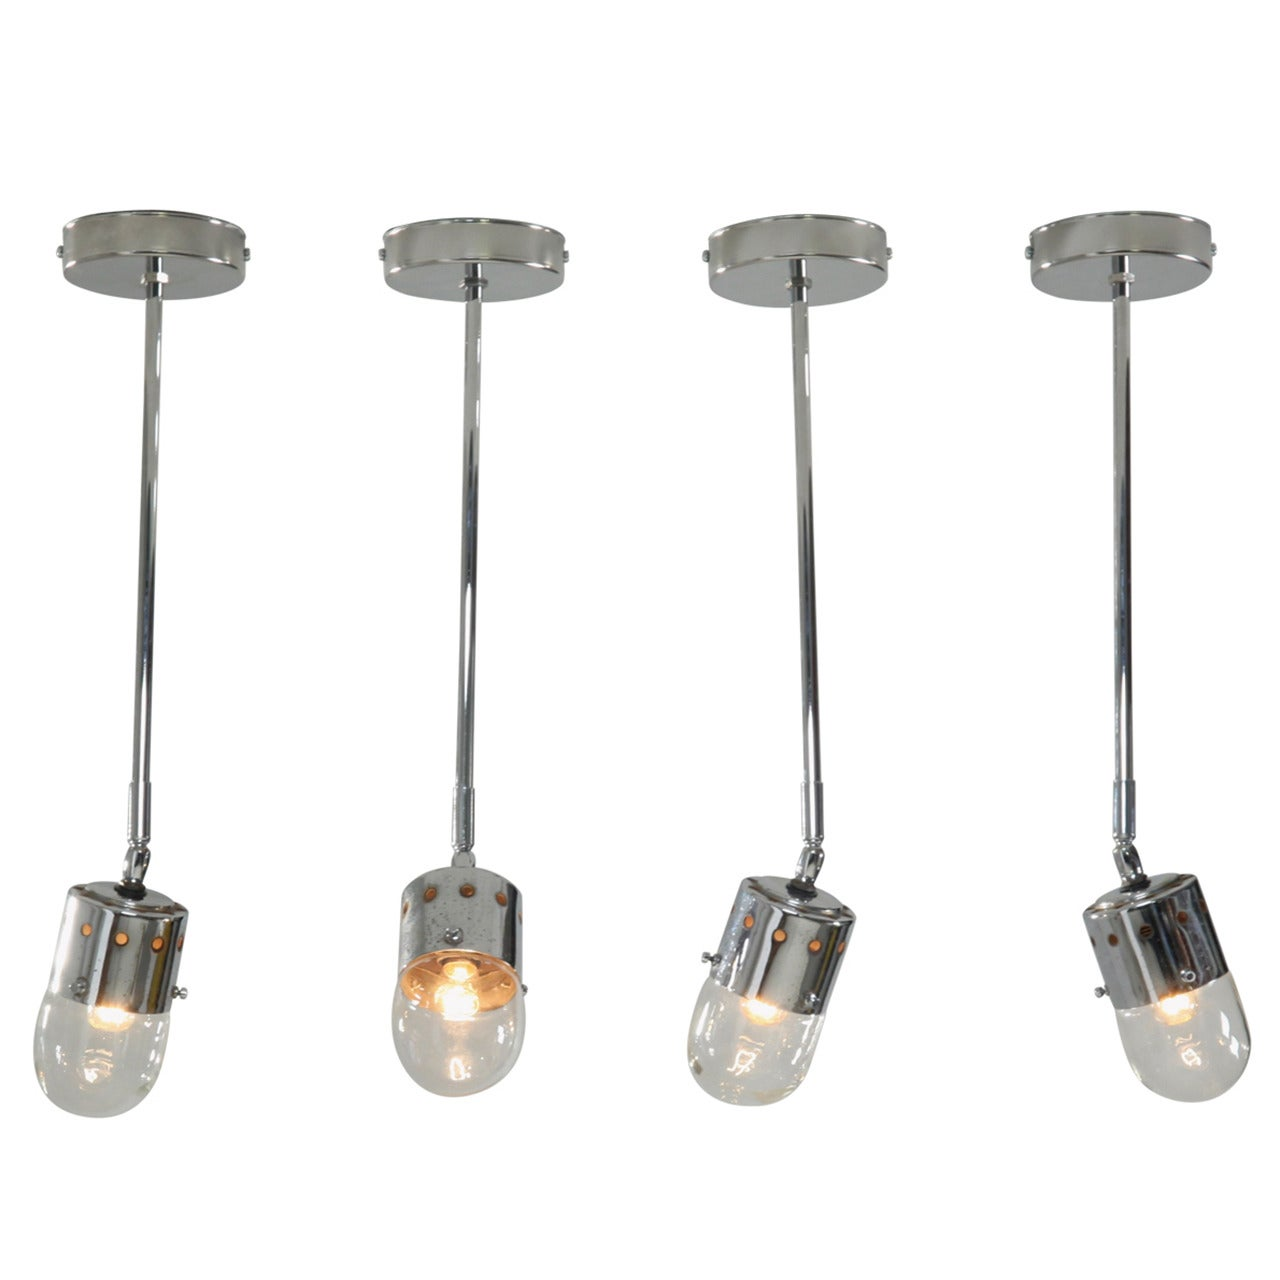 Set of four chrome minimalist Italian ceiling lights, 1950s